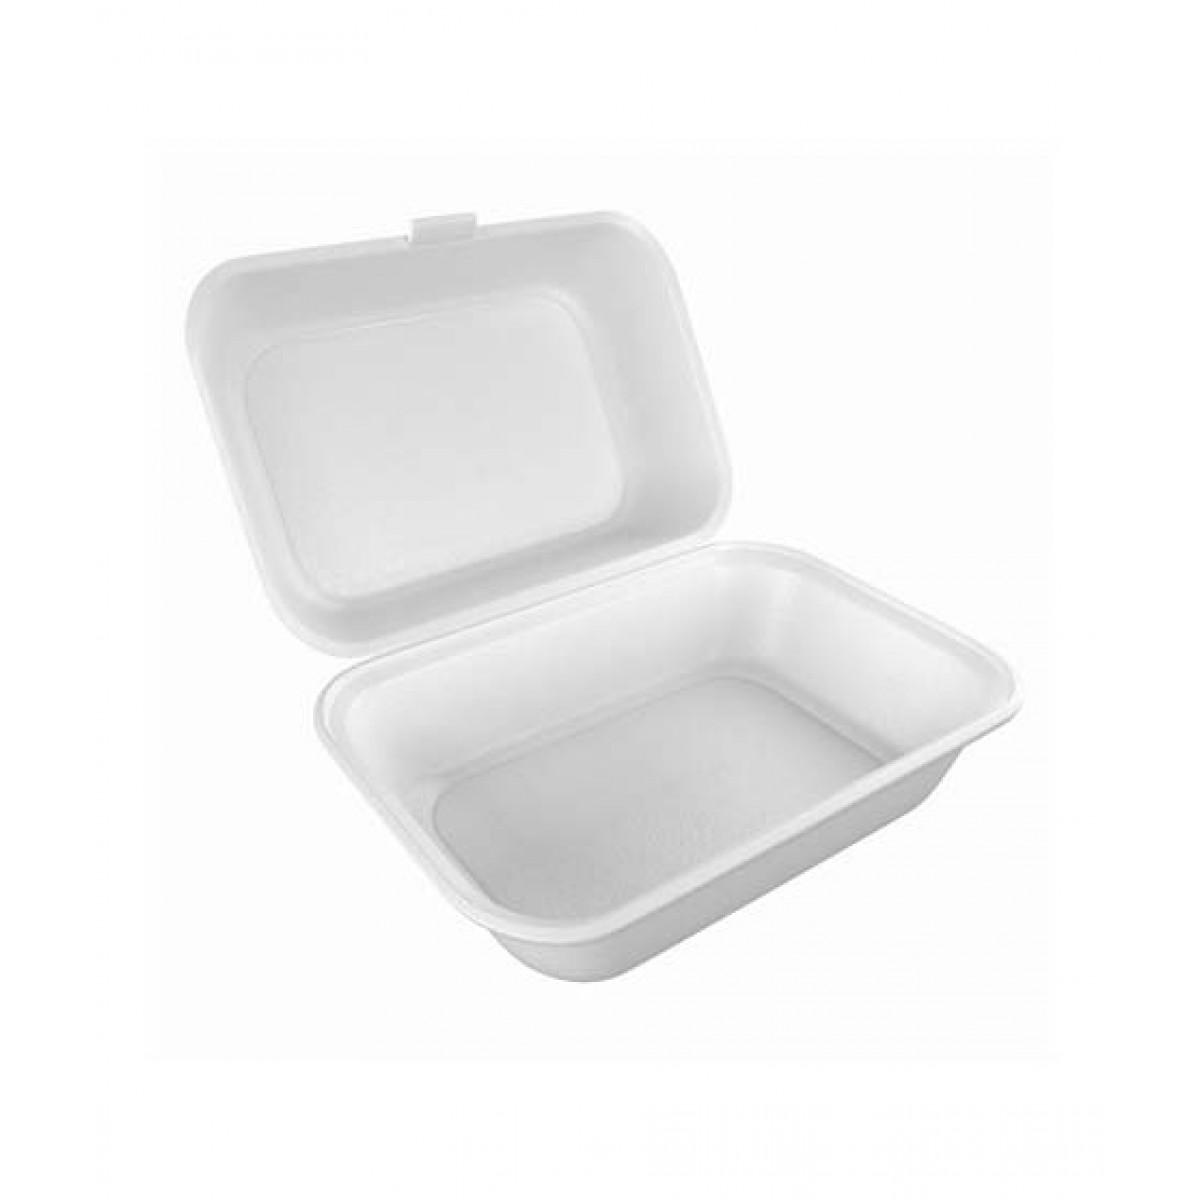 Diyan-e-Store Disposable Food Box Large Pack Of 20